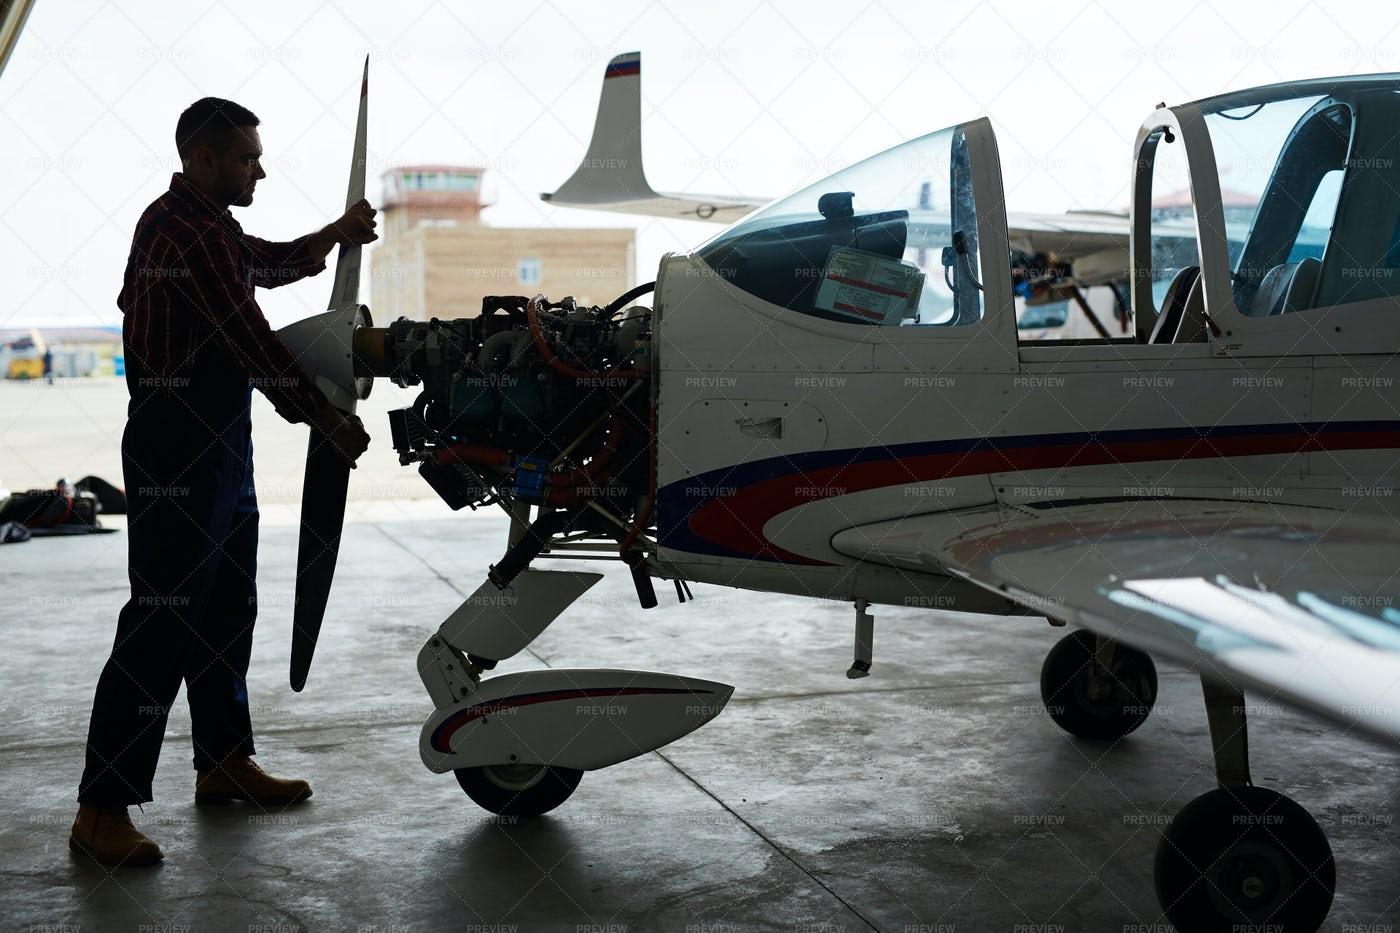 Mechanic Working With Airplane In Hangar: Stock Photos